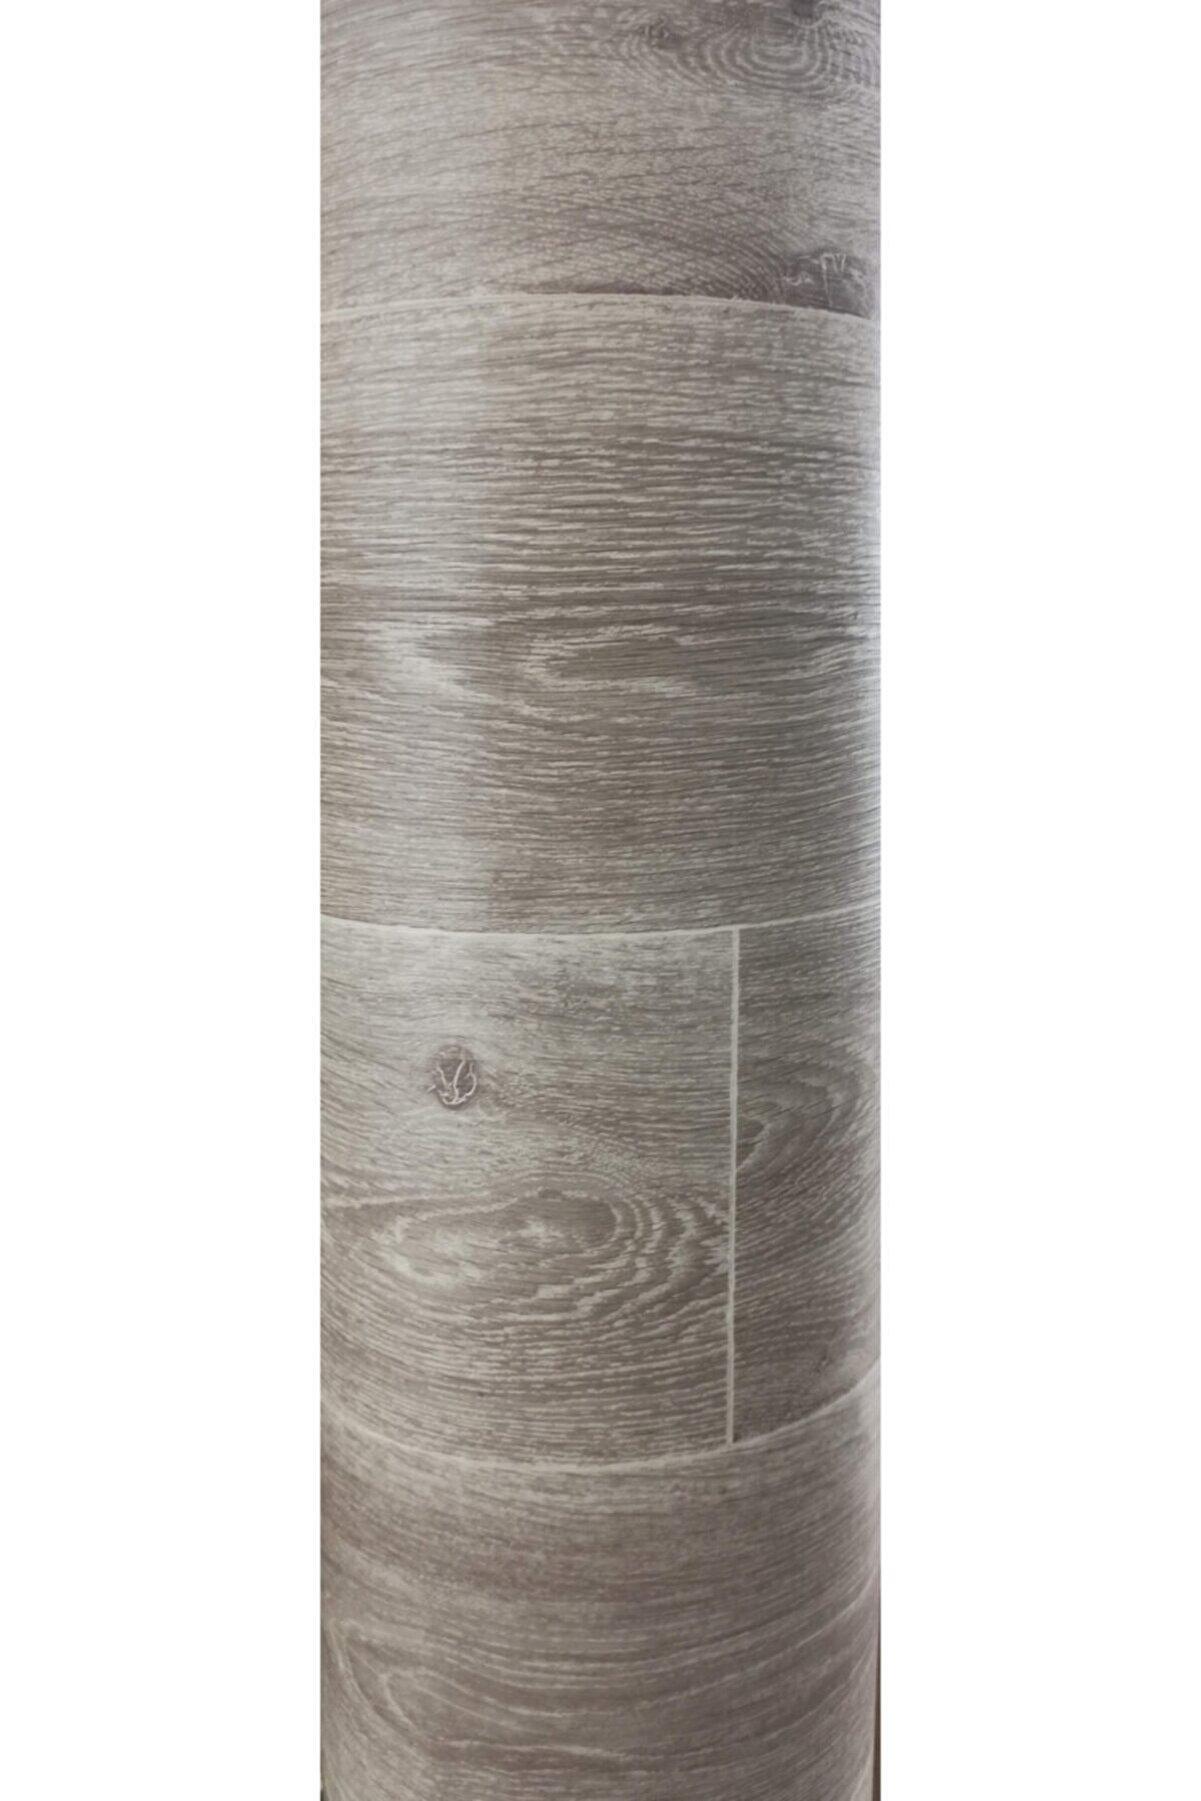 CEYTO Pvc Yerkaplamasıi, Mineflö, Pvc Zemin Döşeme 2,5mm Kalınlık 100 X 200 Cm (GRİ)